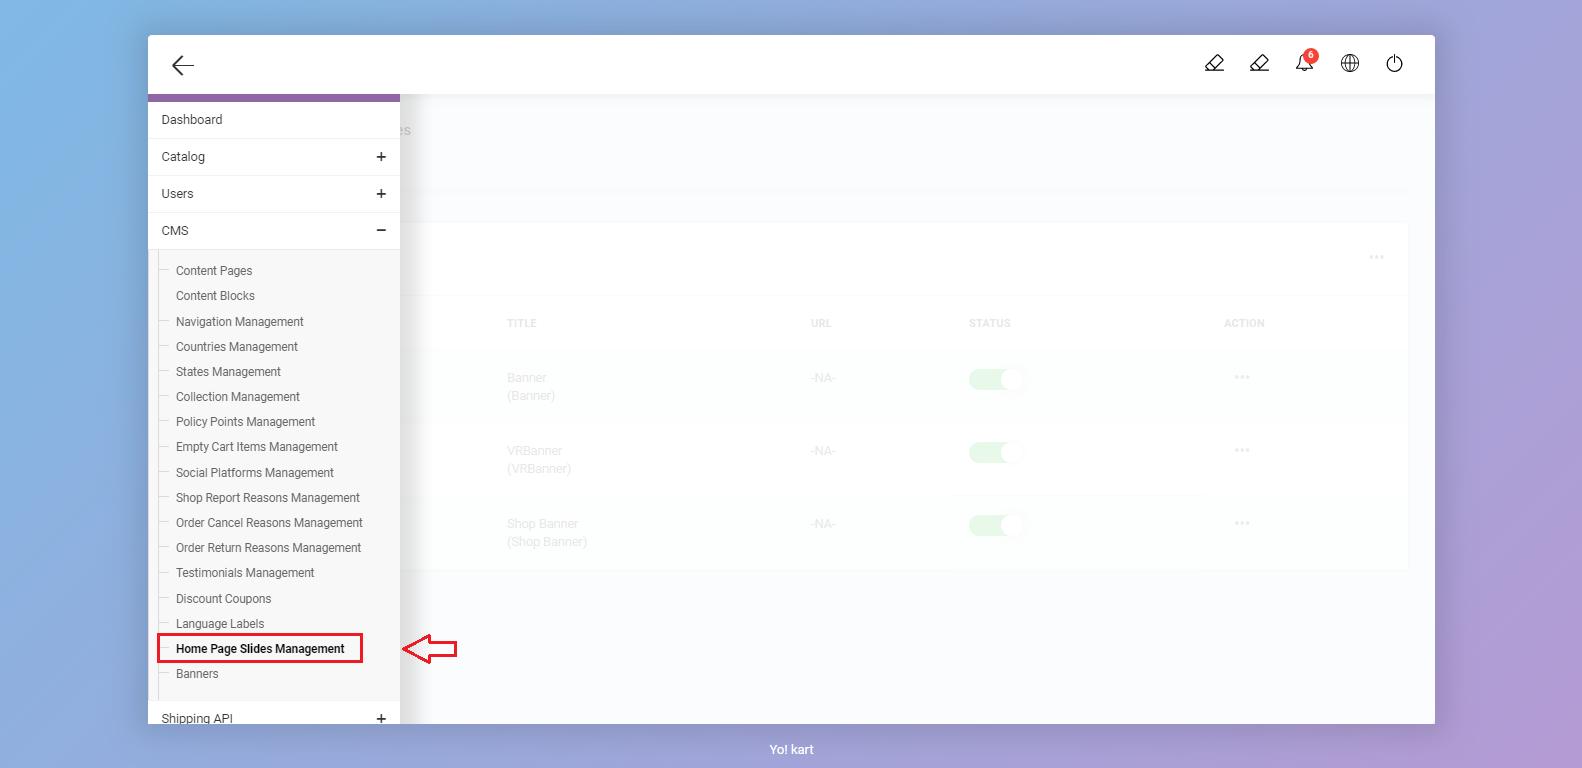 Home Page slides management